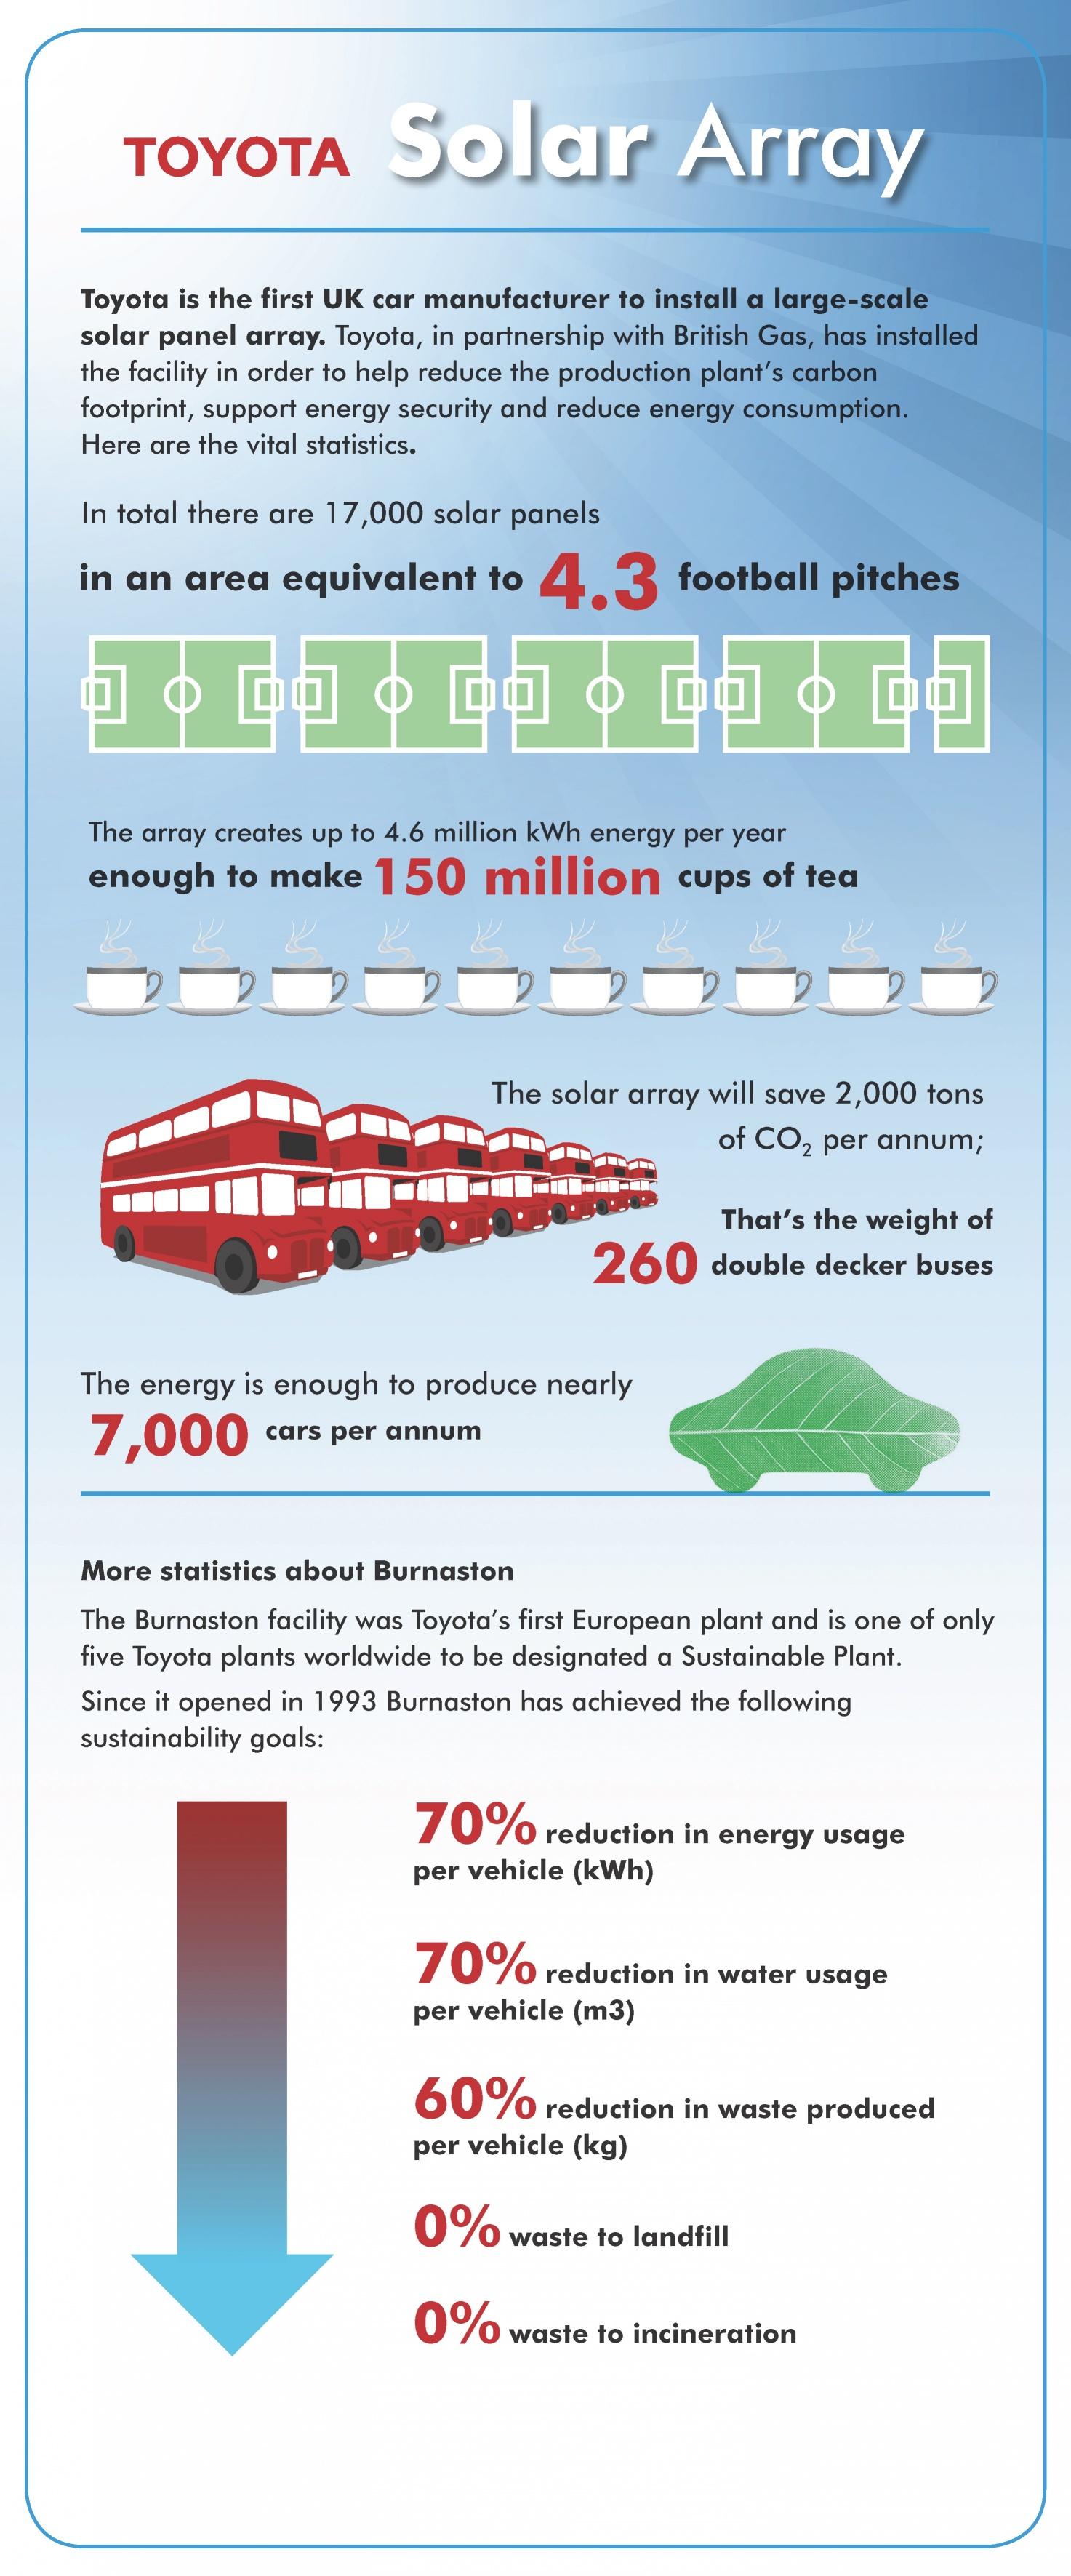 Toyota Solar Array Infographic